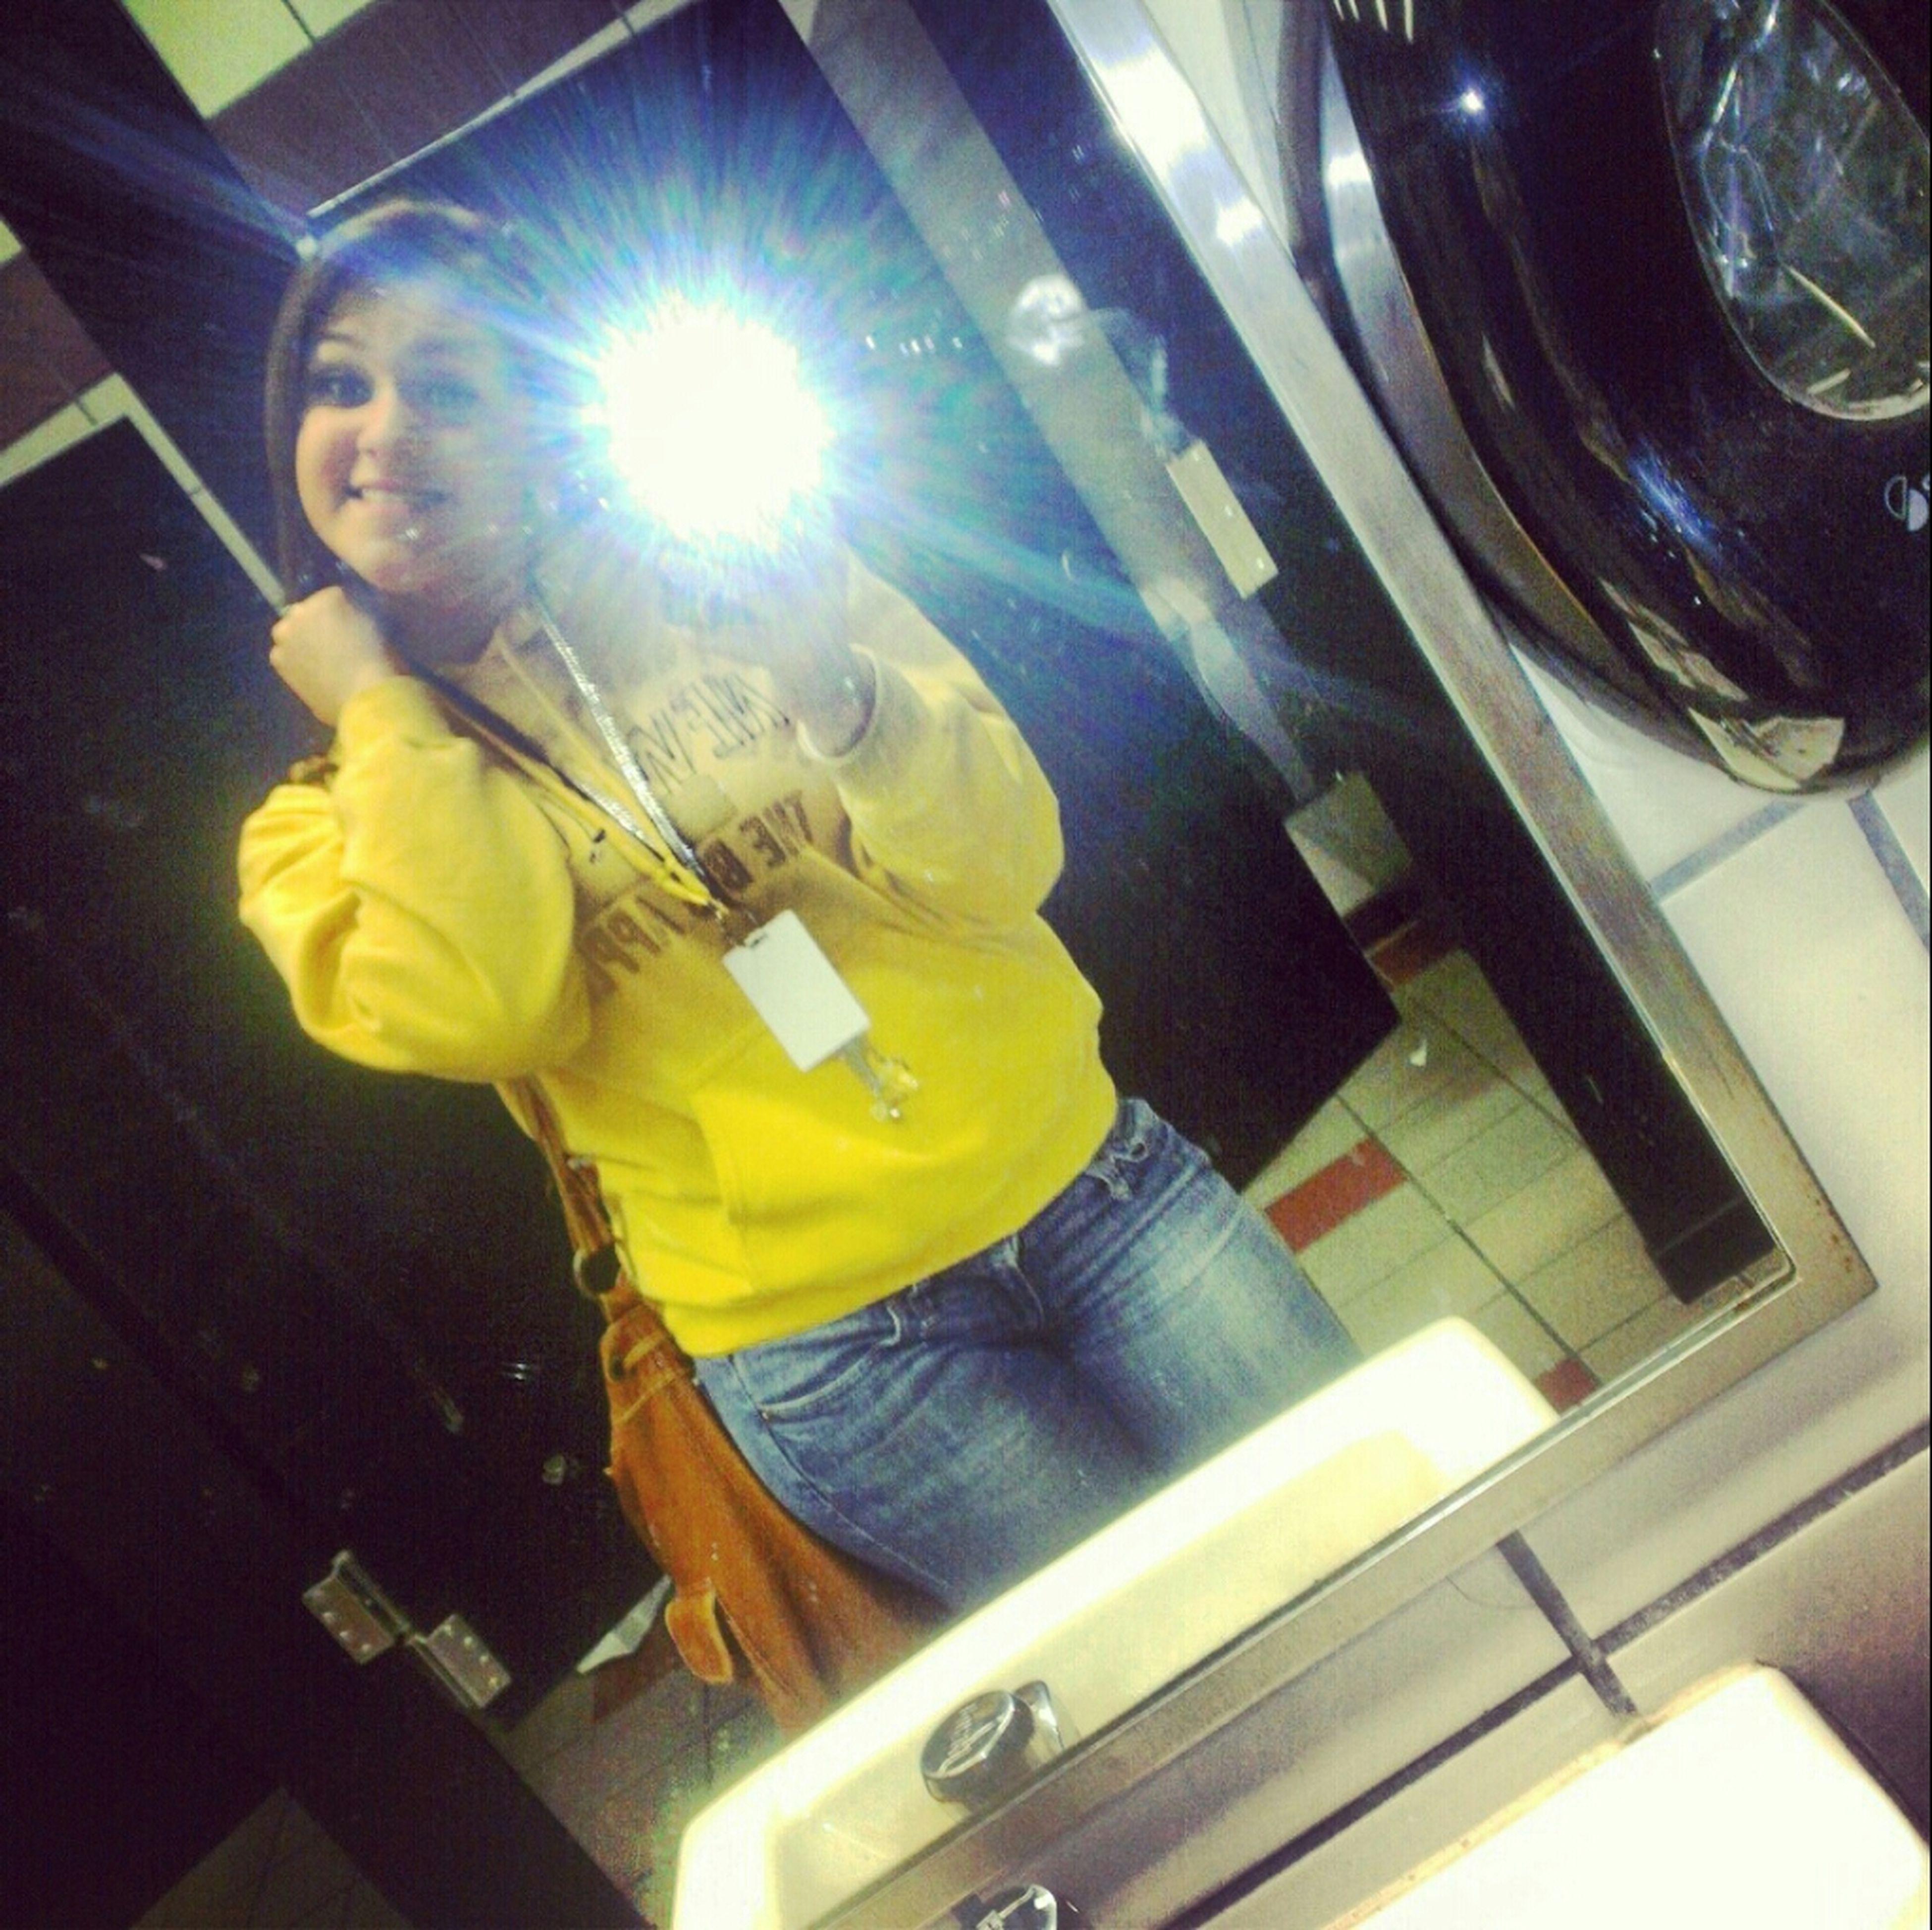 School earlier , #BumminIt #Yellow #Smile #Friday #Bathroom #SomethingSlight